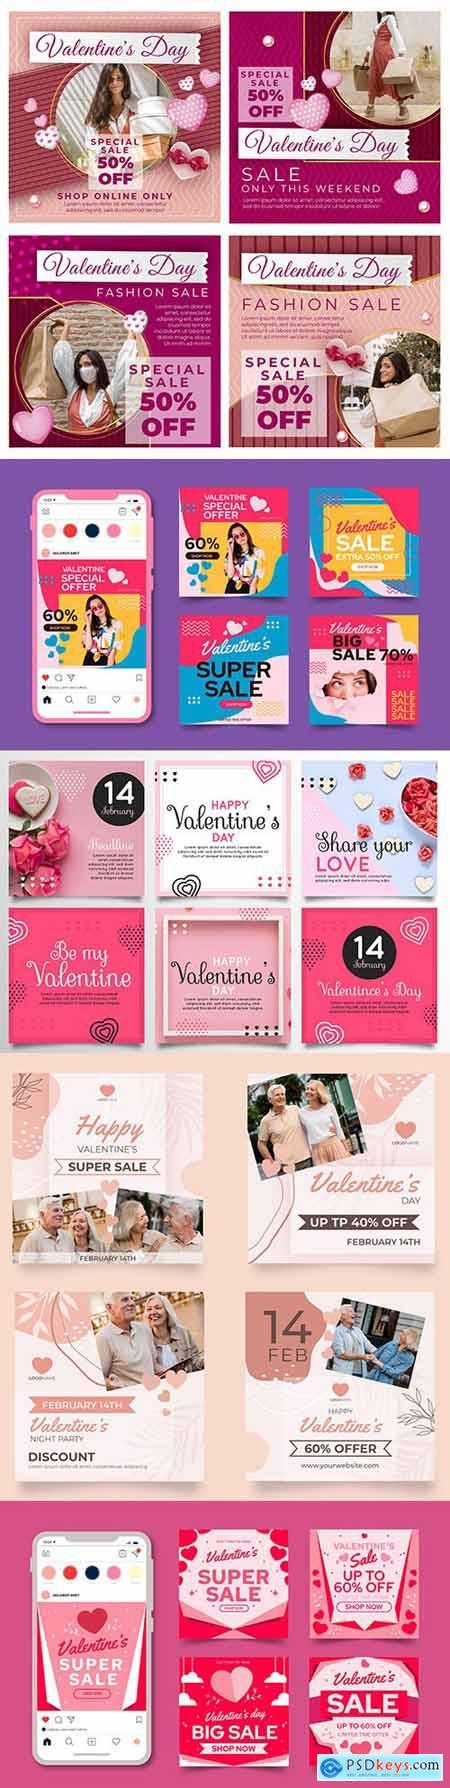 Valentines Day collection posts on instagram design